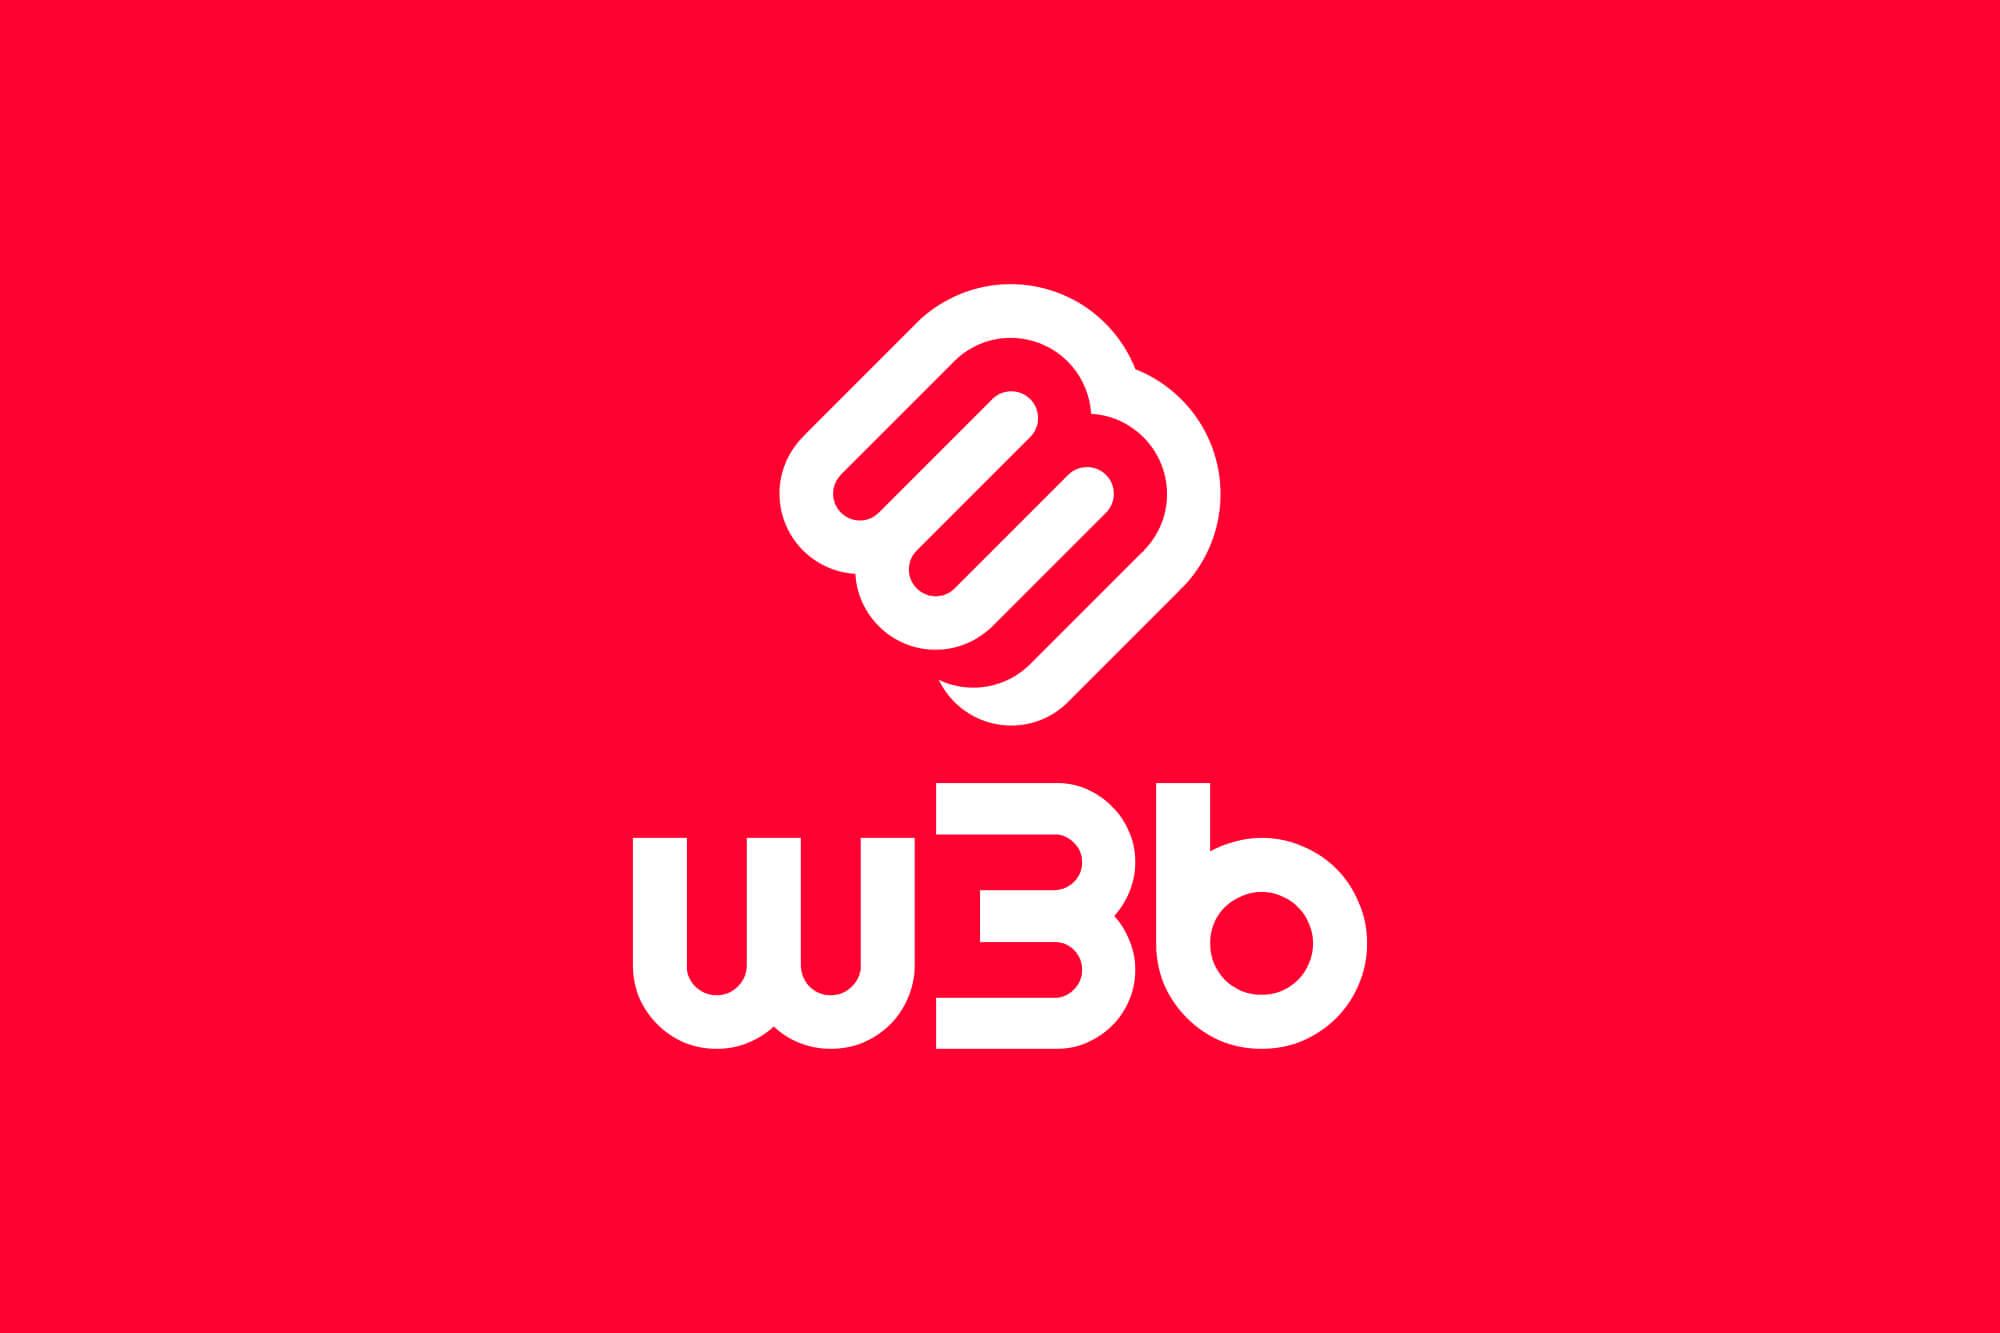 w3b vertical